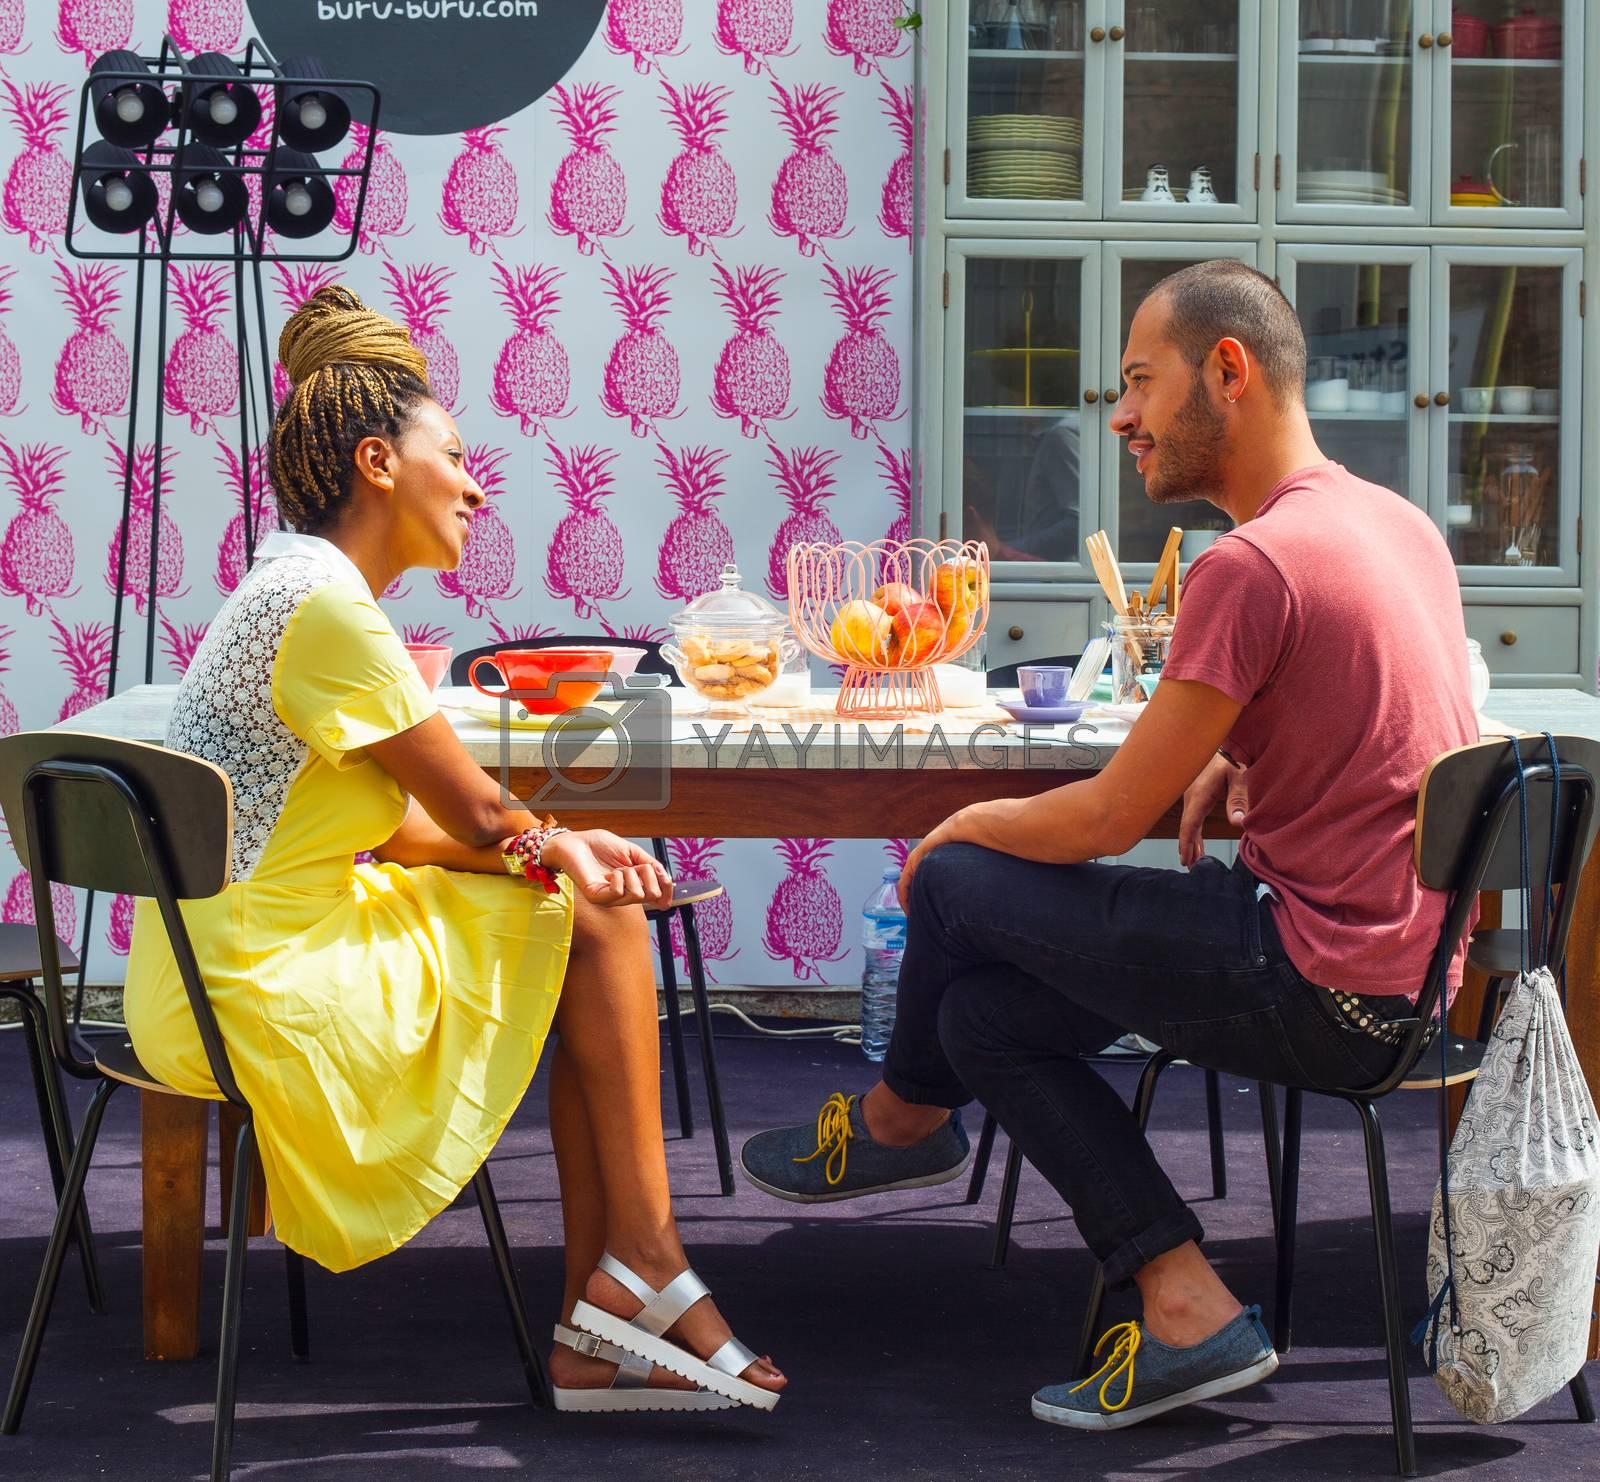 MILAN, ITALY - APRIL 16: Couple of friends enjoying a conversation in the kitchen room at Buru-buru stand in theTortona space location during Milan Design week on April 16, 2015